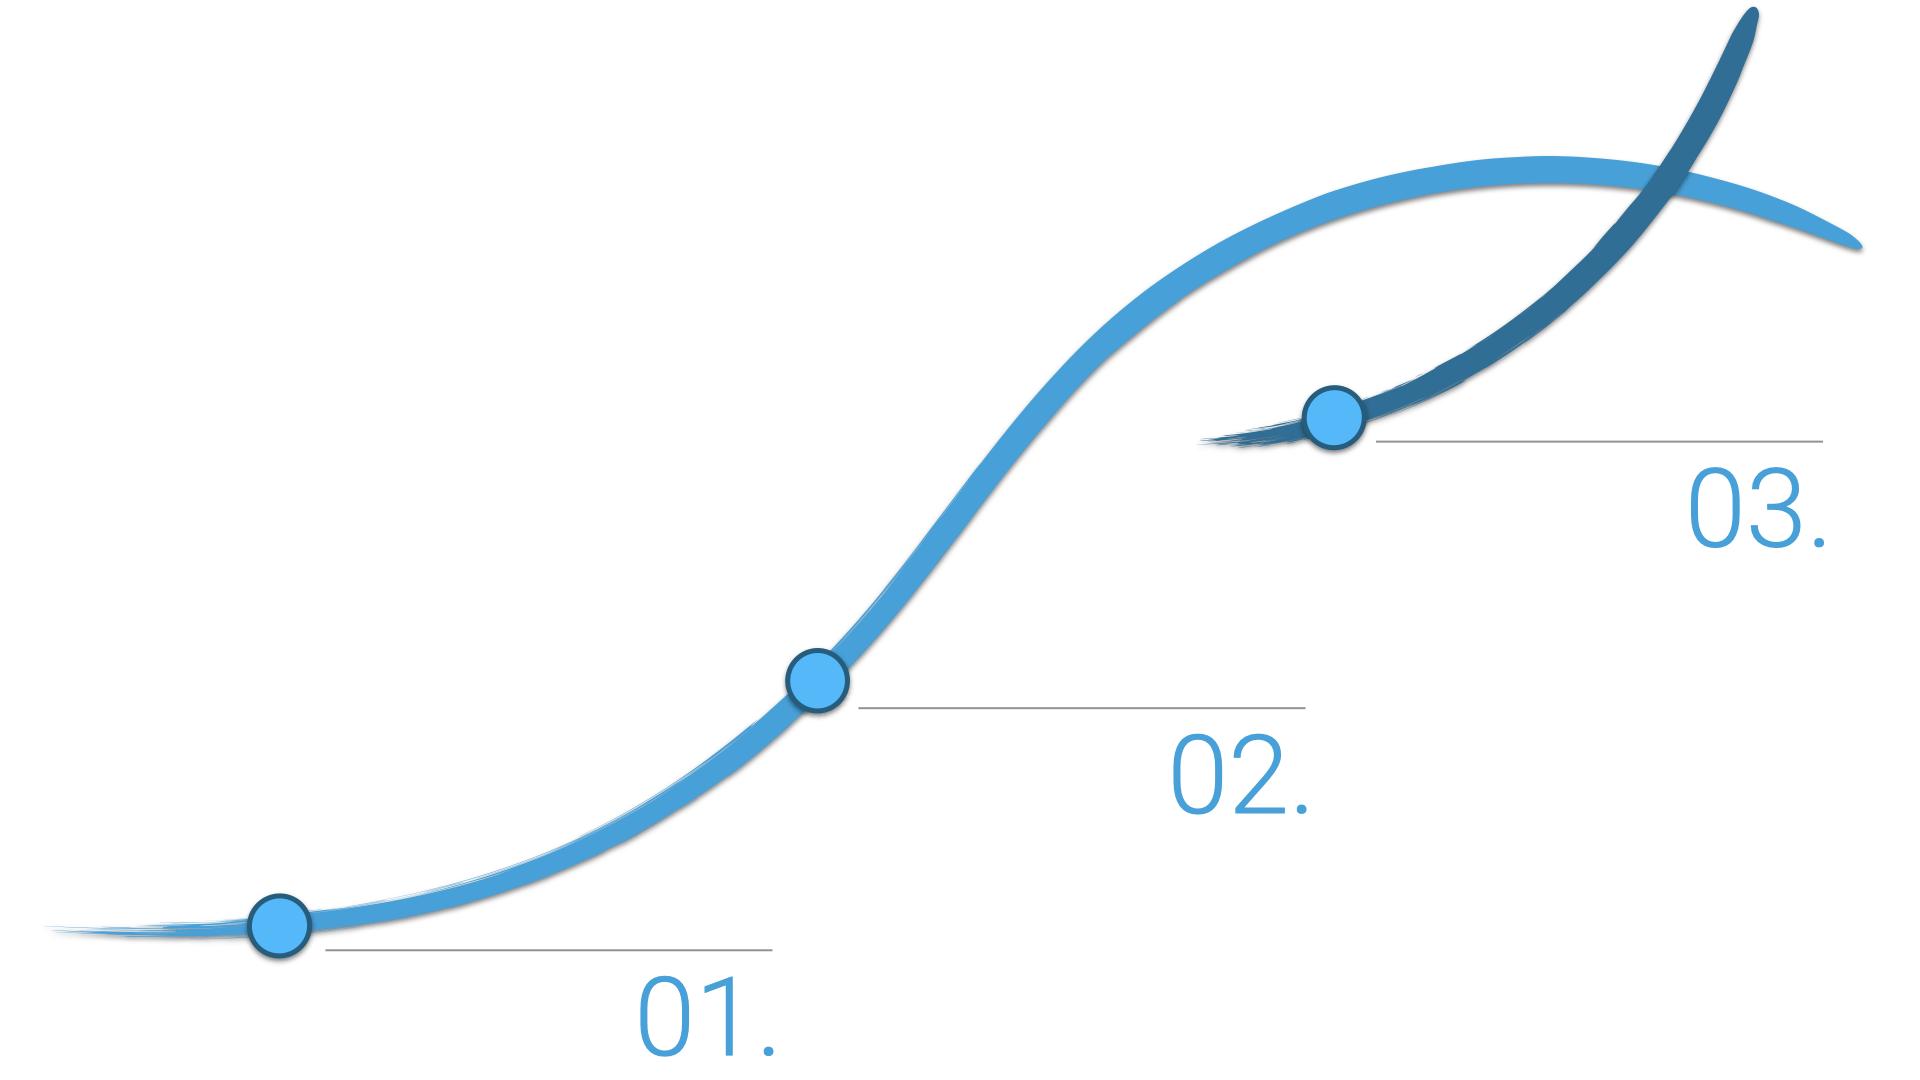 3-way-engagement-graph